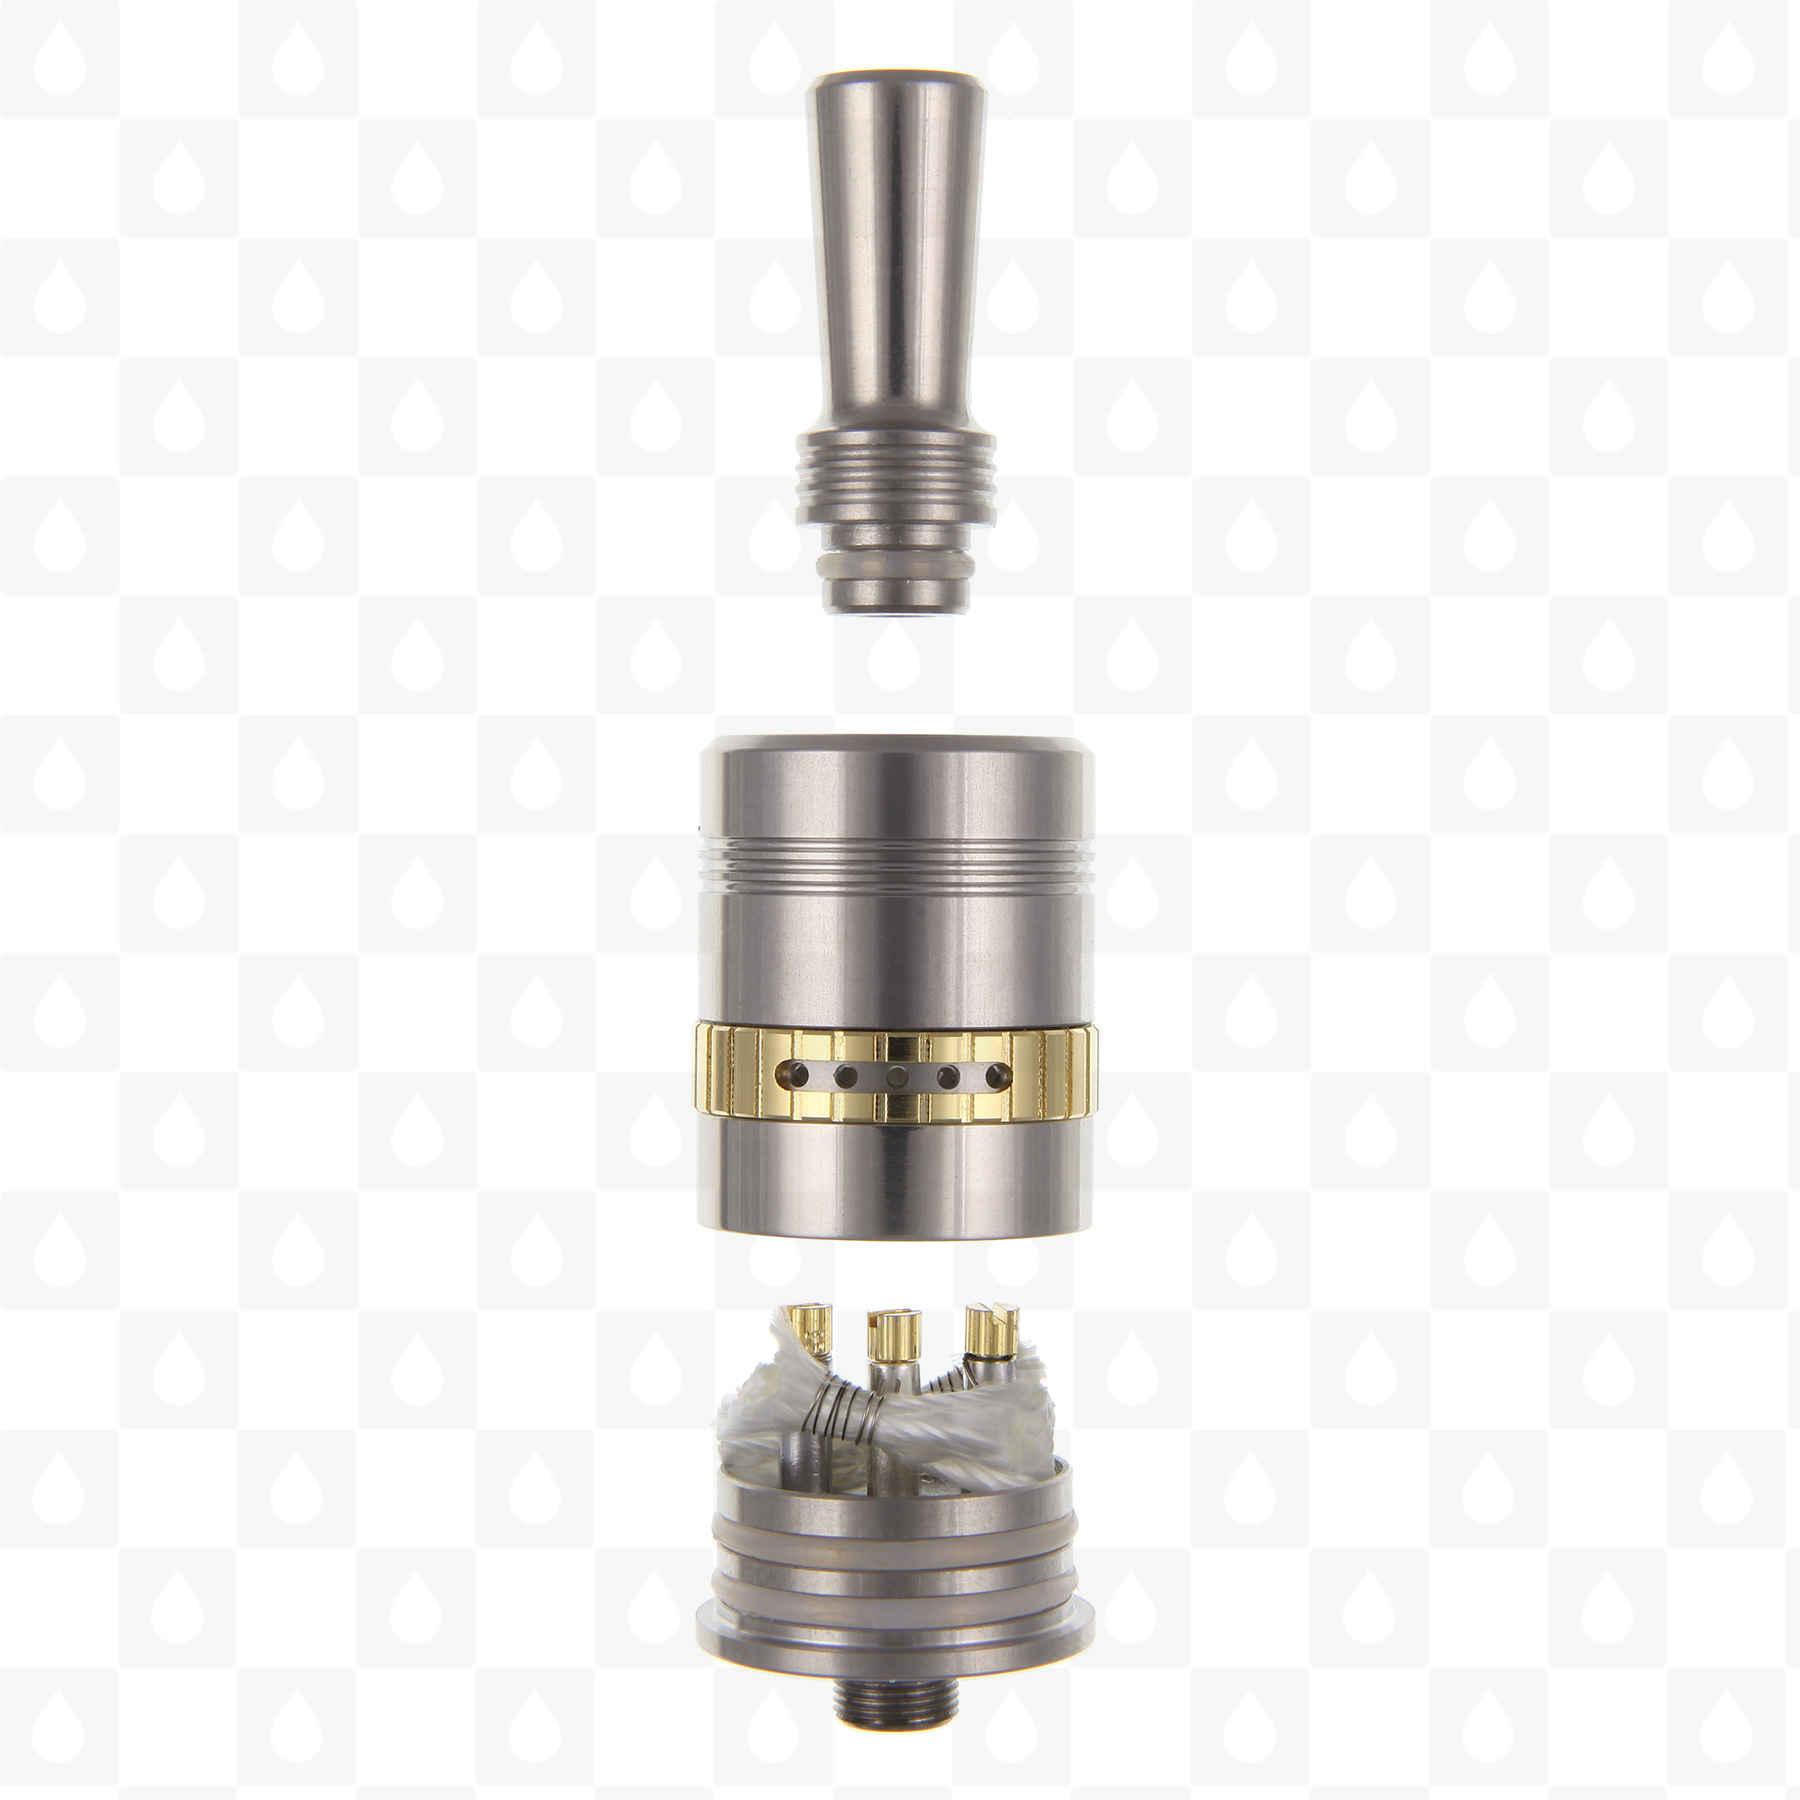 Buy Pulse 24 Dual Coil BF RDA By Vandy Vape & Tony B ... |Scar Dual Coil Rda